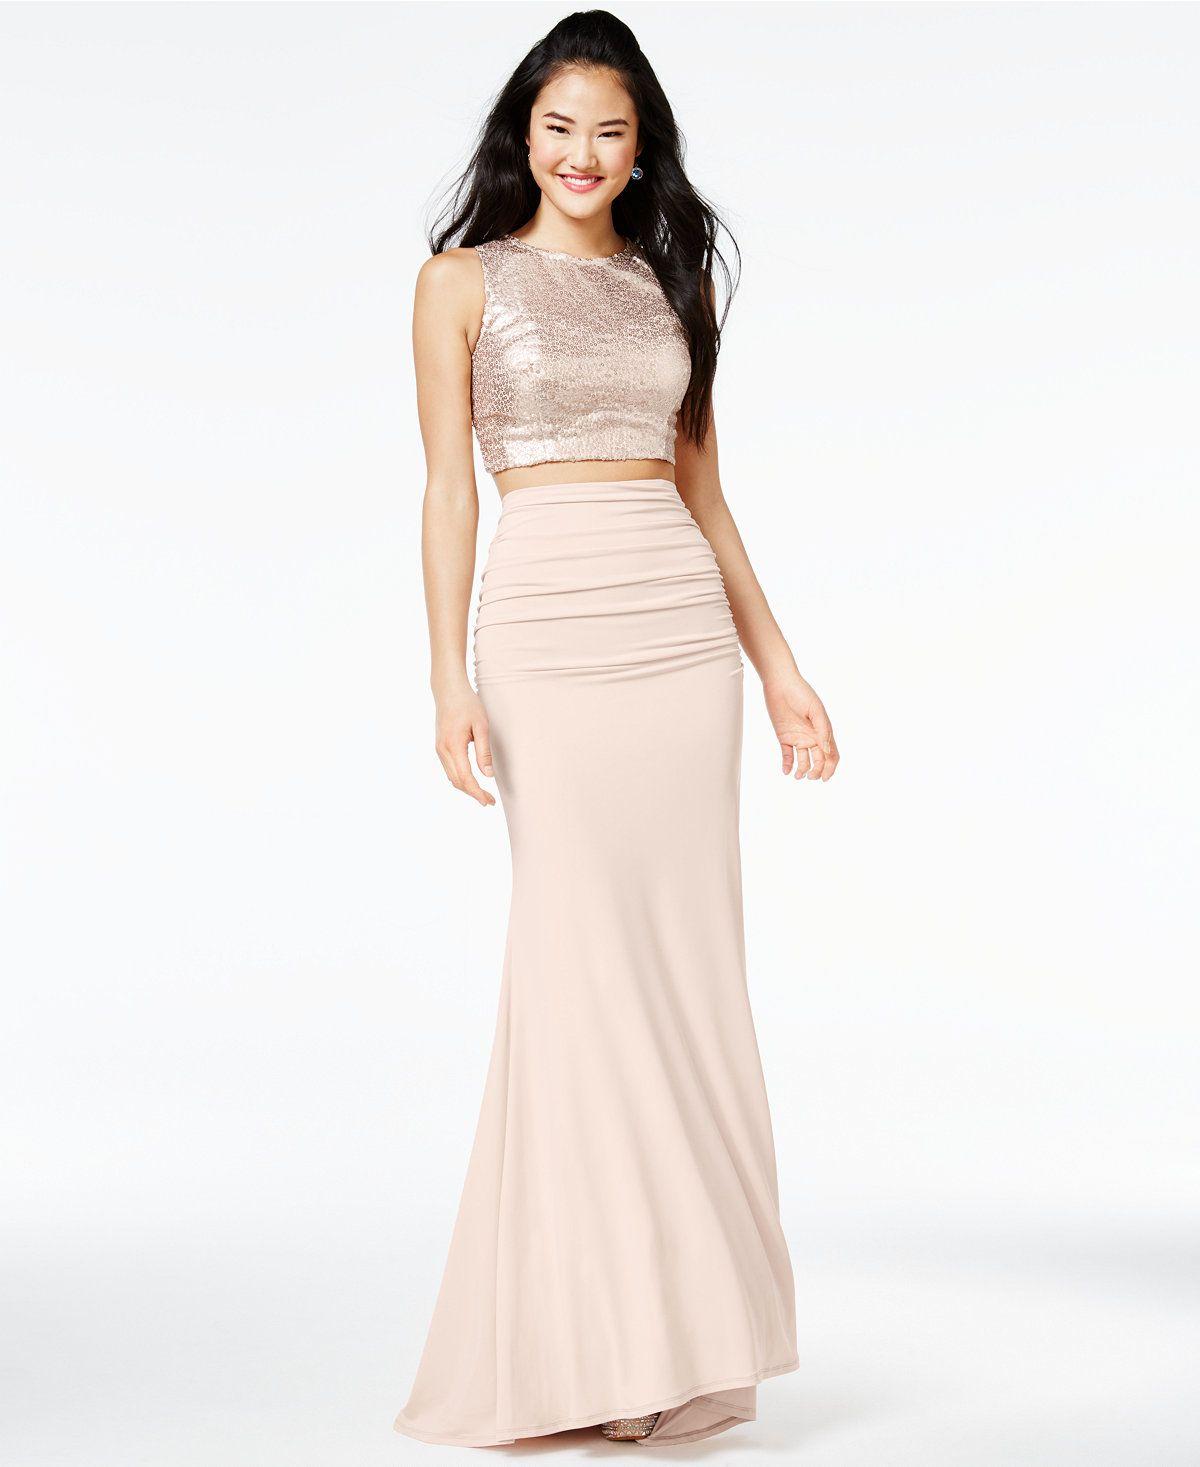 094c6ab3af City Studios Juniors  2-Pc. Sequined Gown - Juniors Dresses - Macy s ...